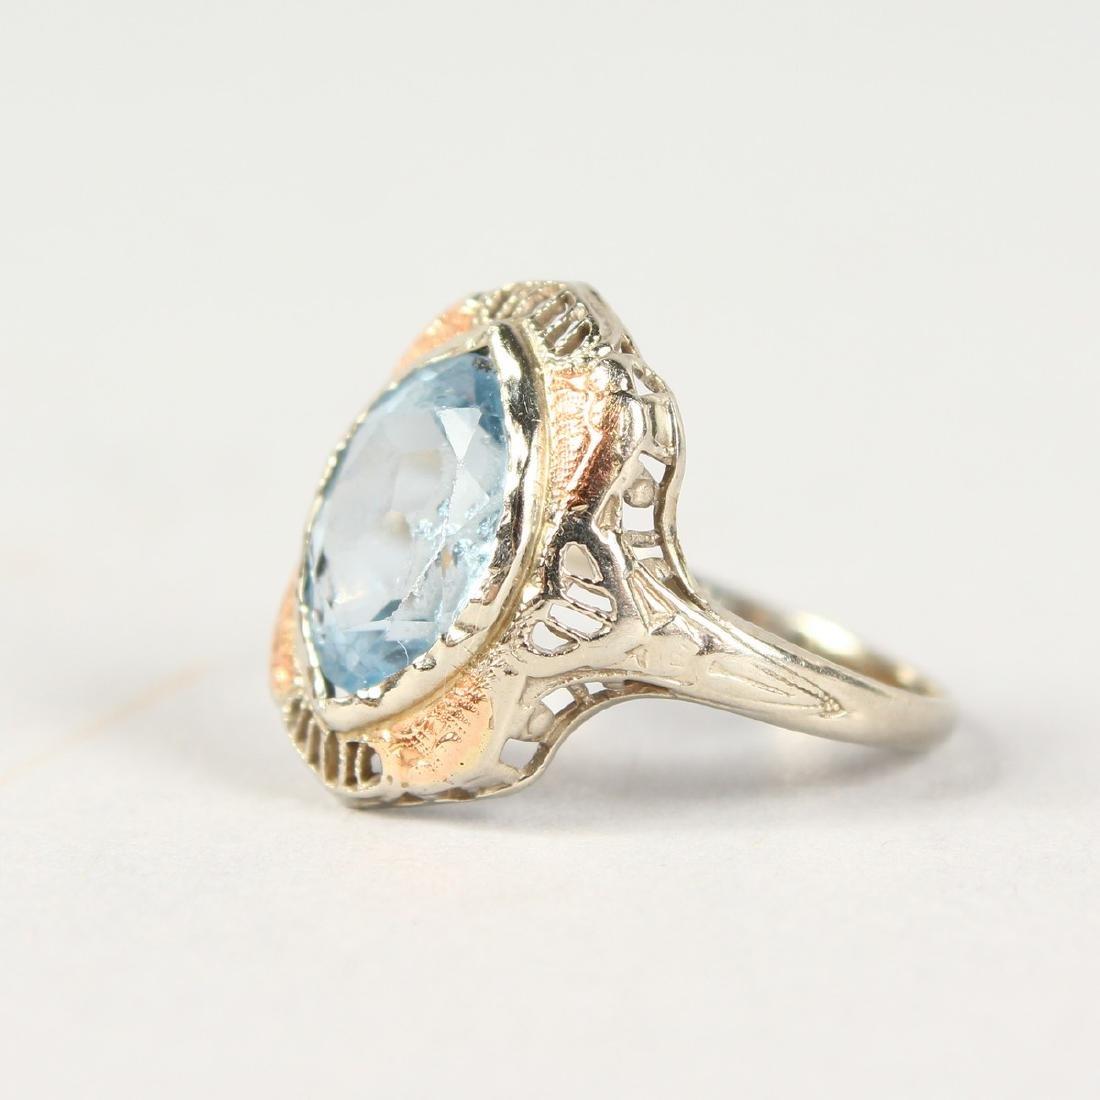 AN ART DECO WHITE GOLD DIAMOND RING.